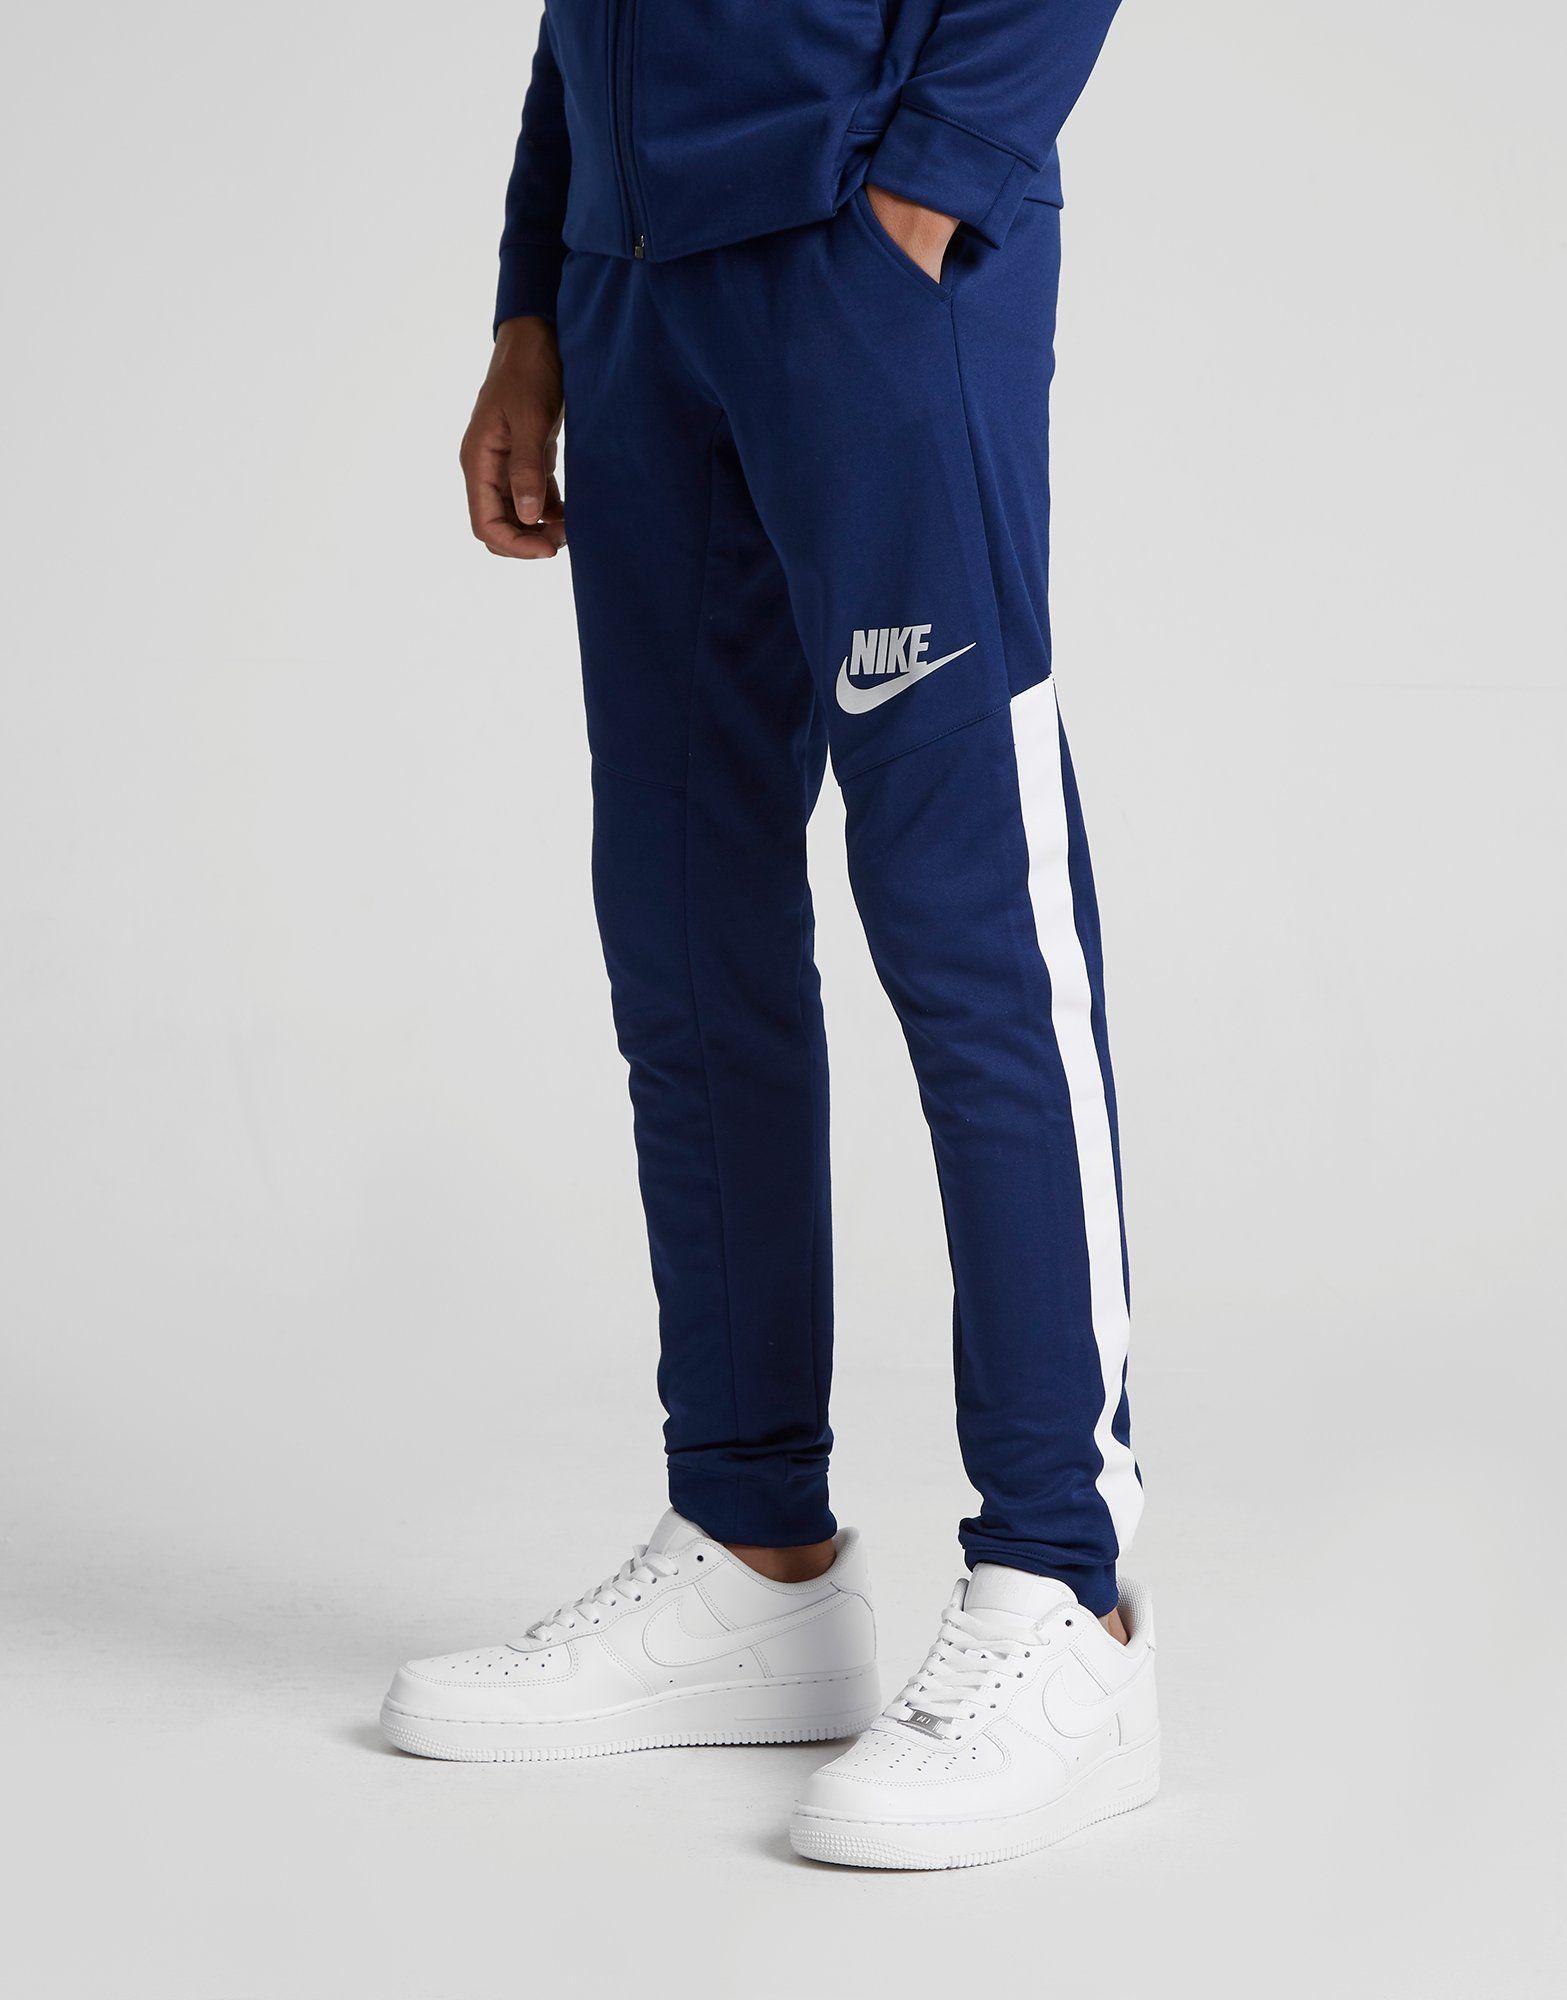 7979f02634b1 Nike Tribute Poly Track Pants Junior